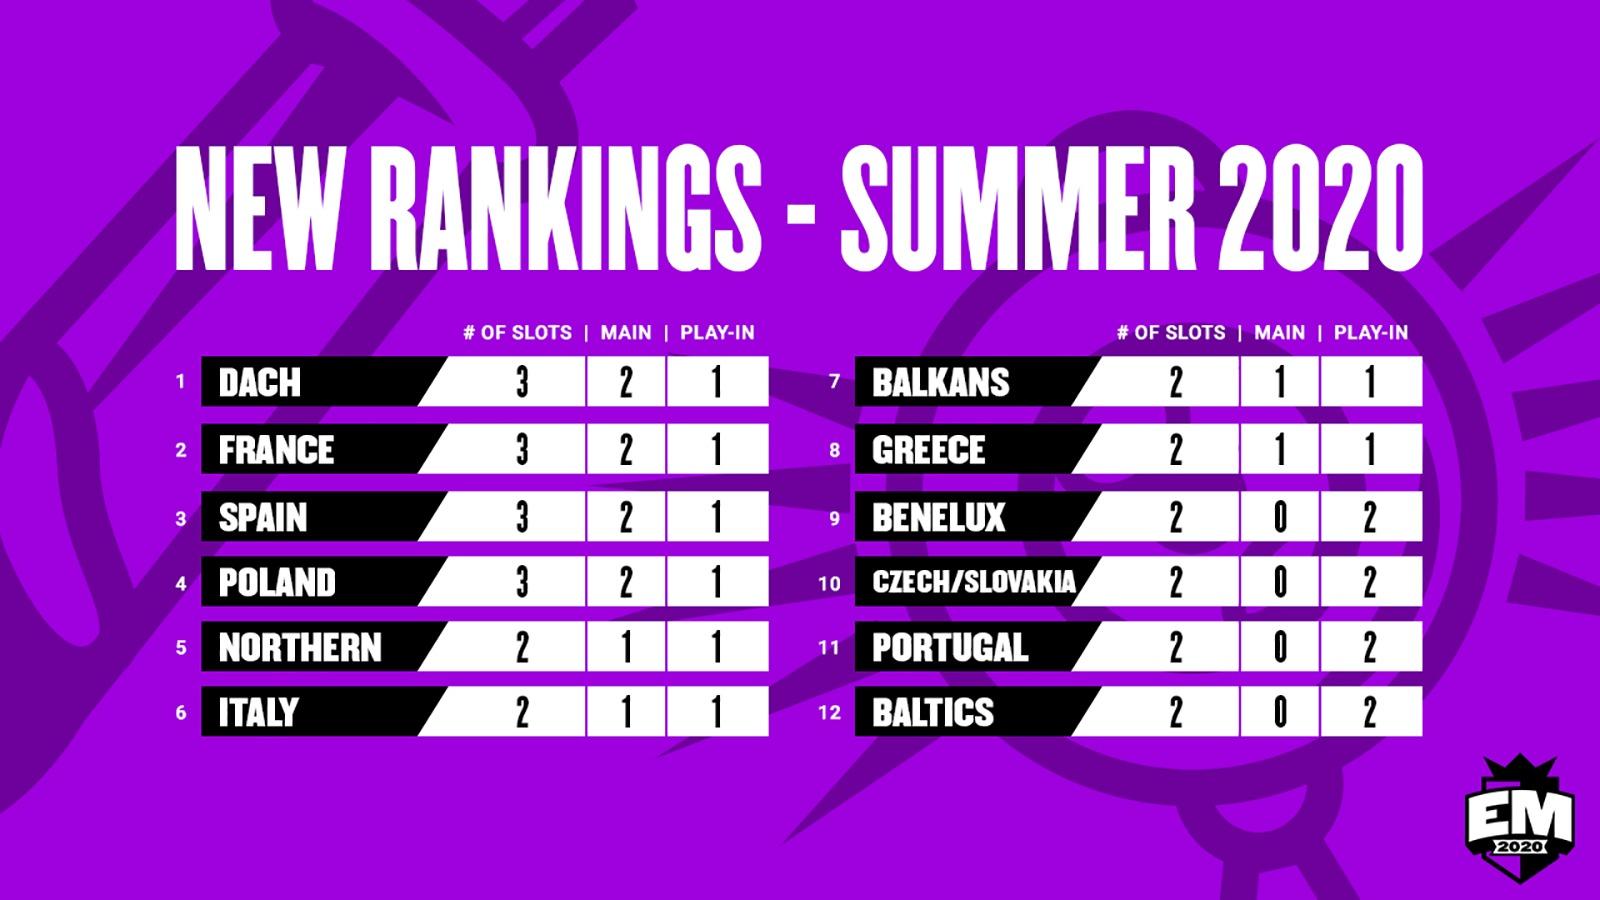 rankings european masters summer 2020